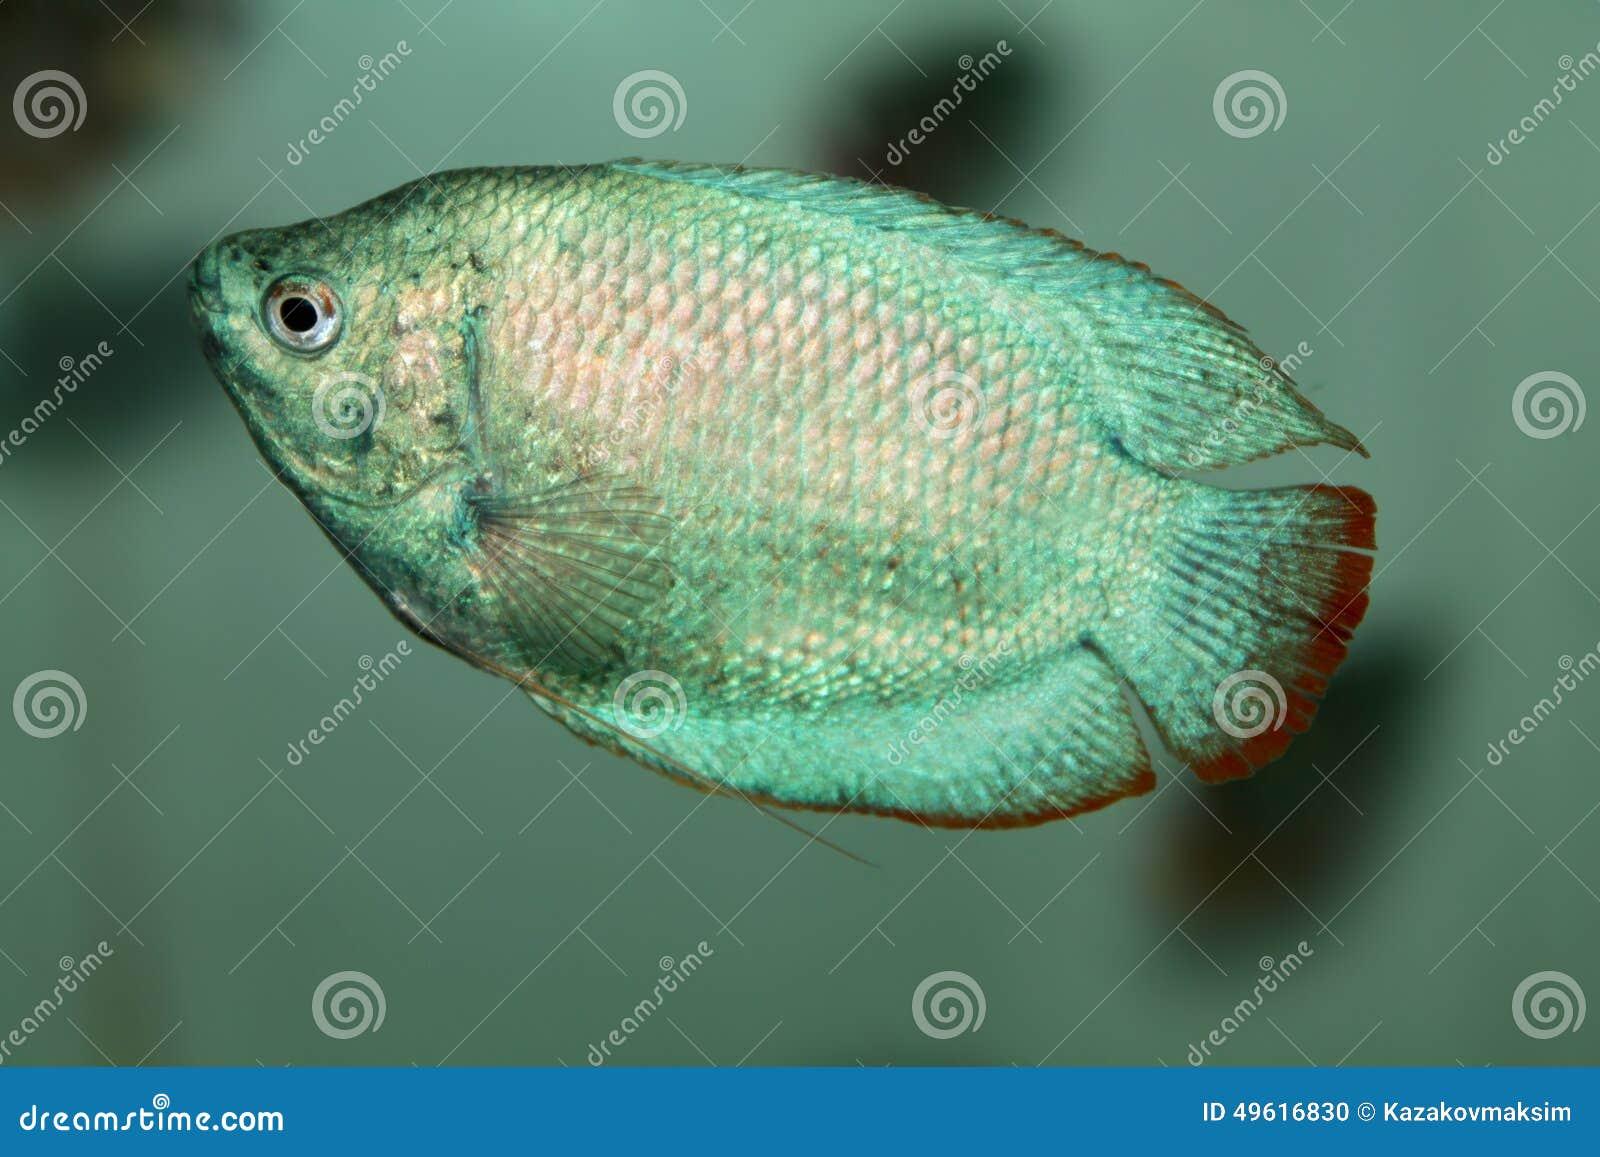 Powder Blue Dwarf Gourami Aquarium Fish Stock Photo